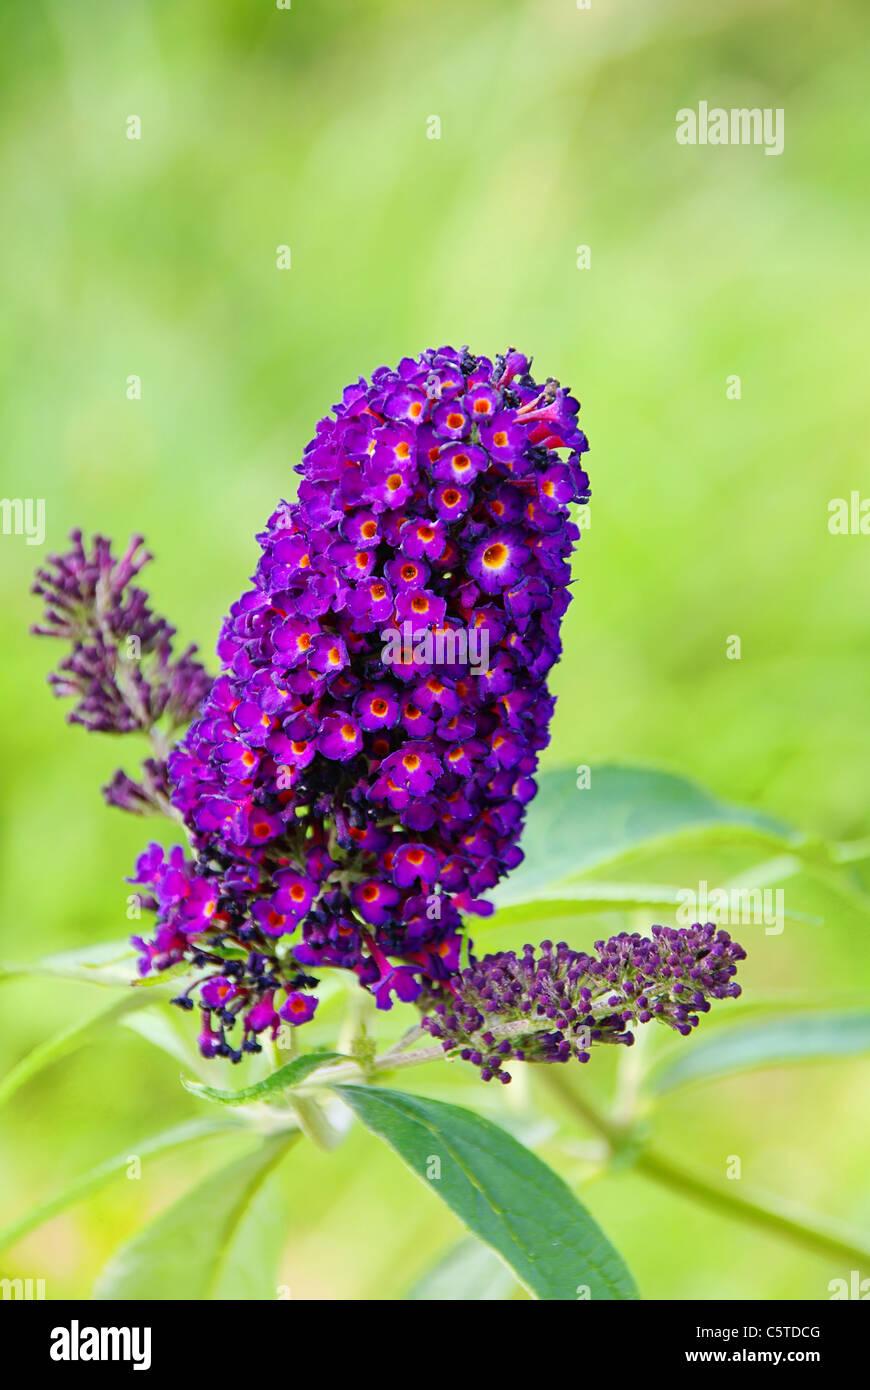 Sommerflieder - butterfly bush 02 - Stock Image